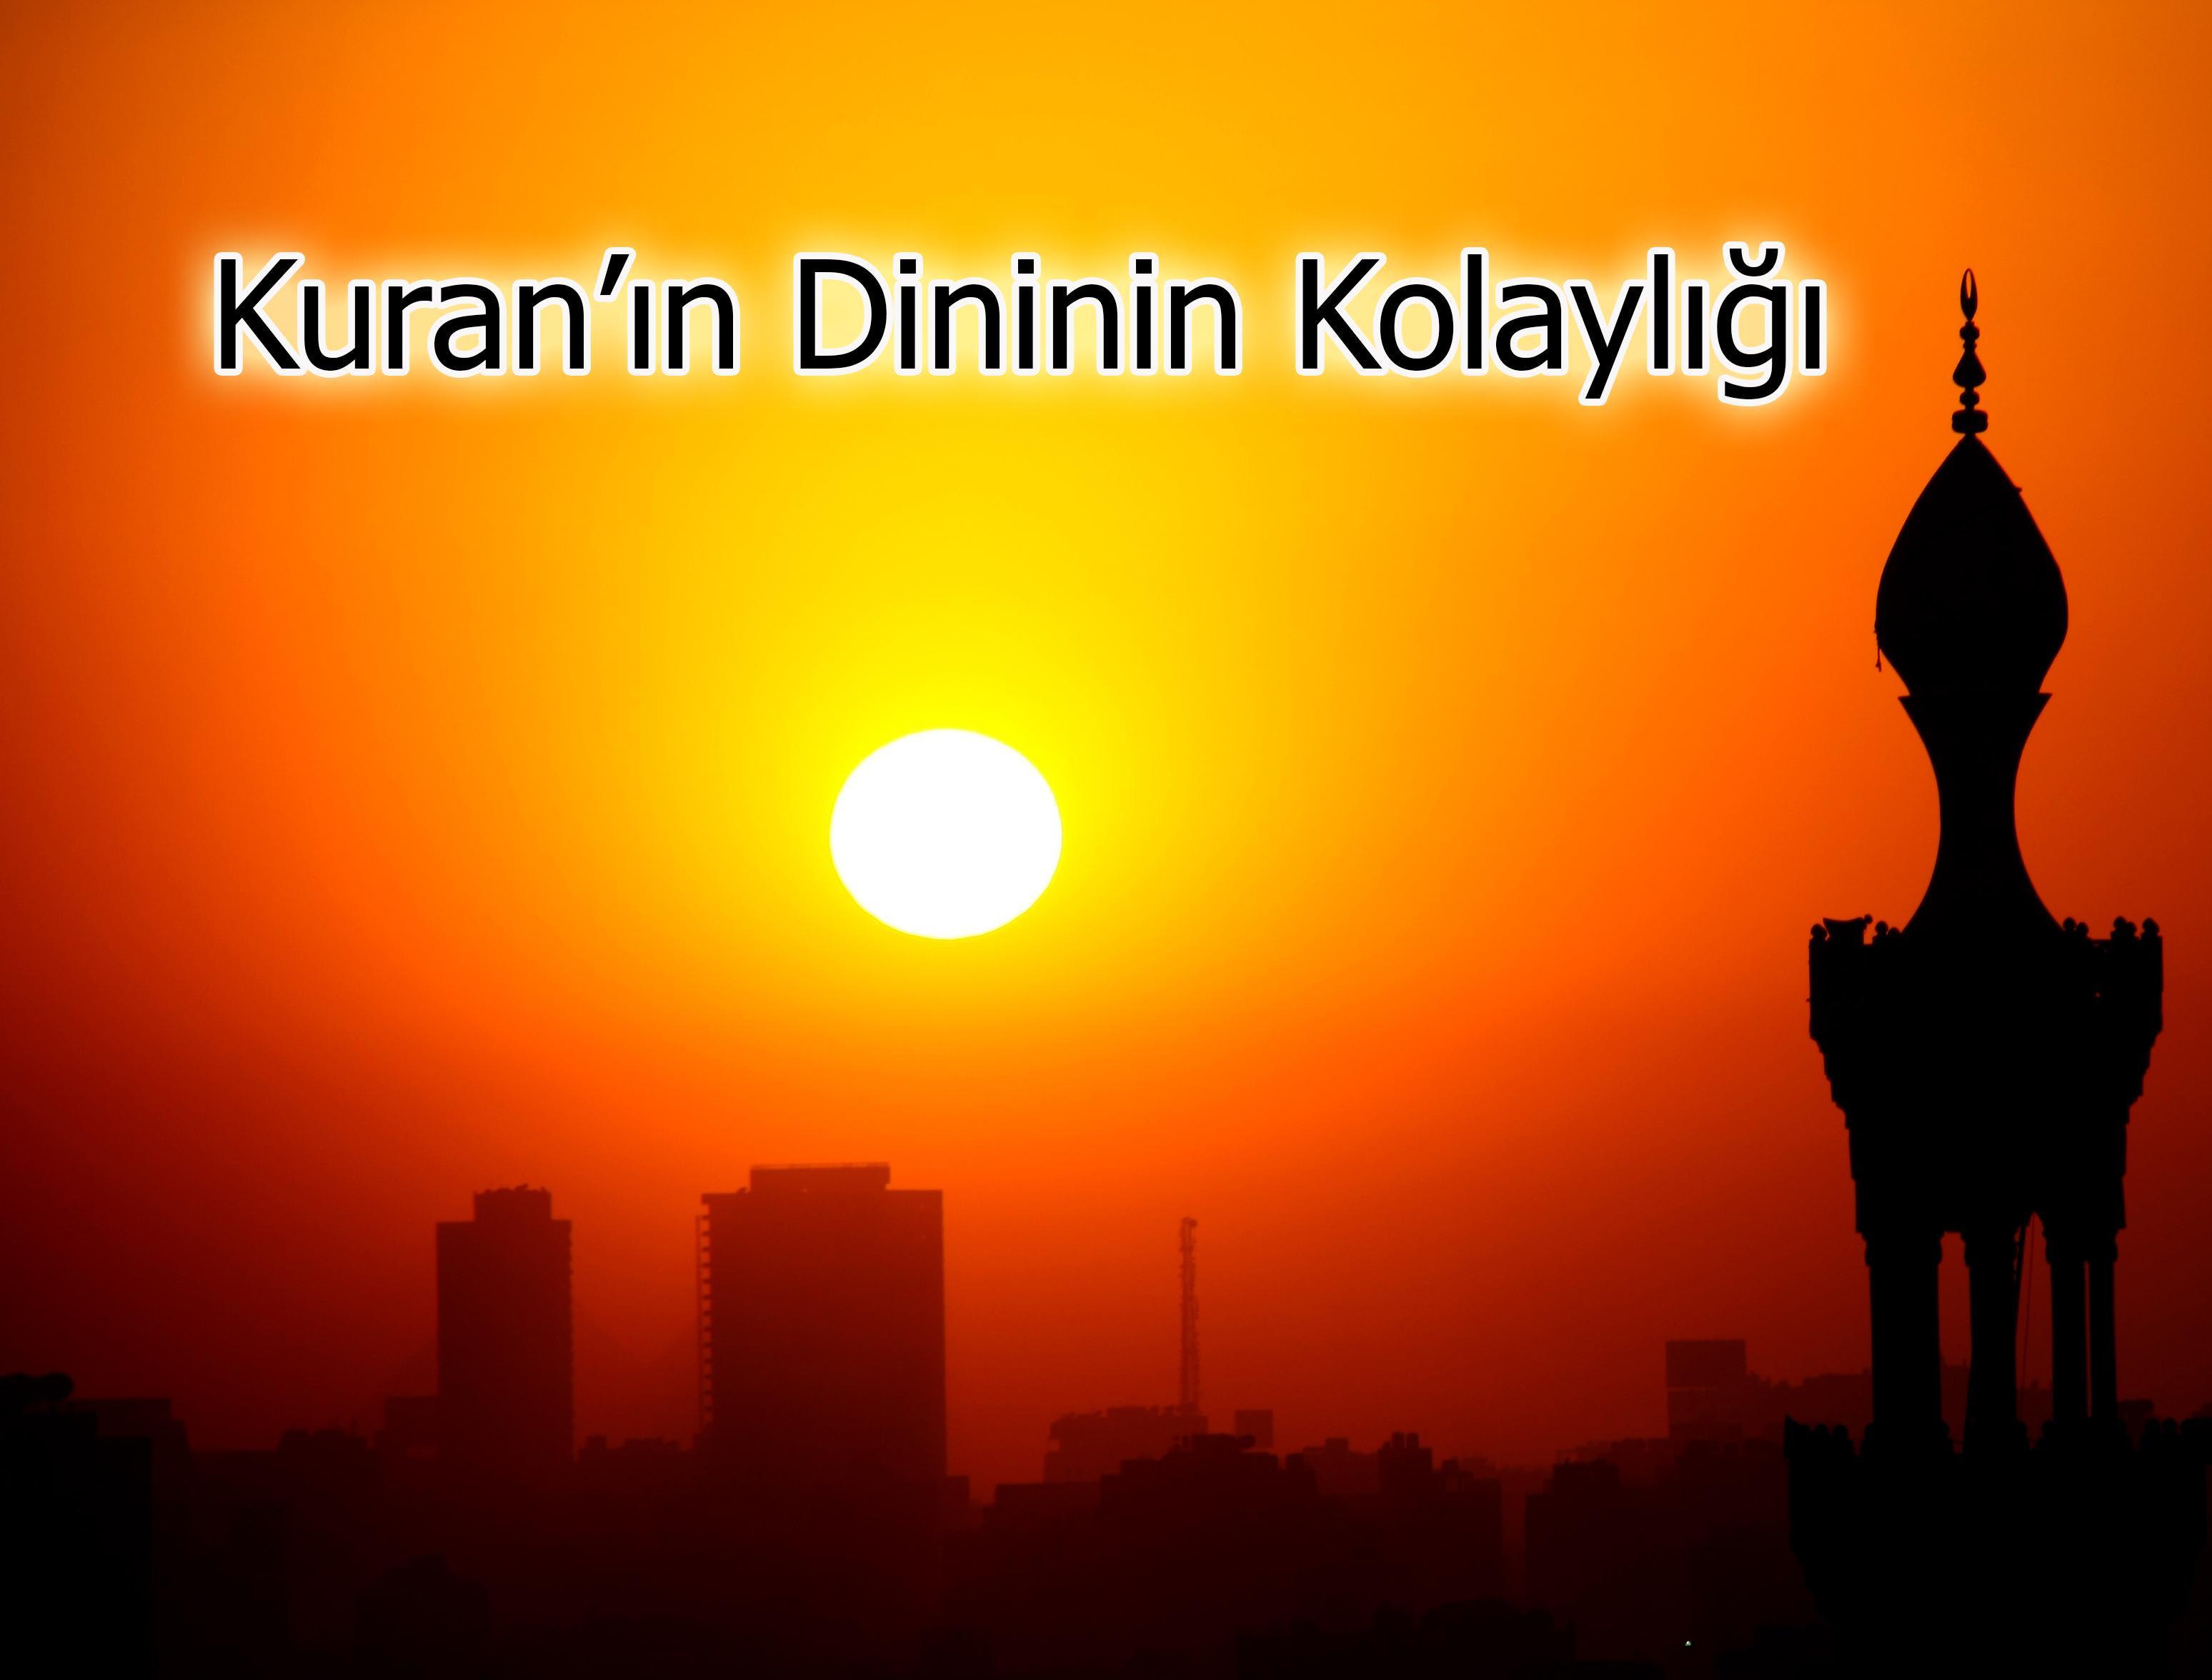 Kuran'ın Dininin Kolaylığı